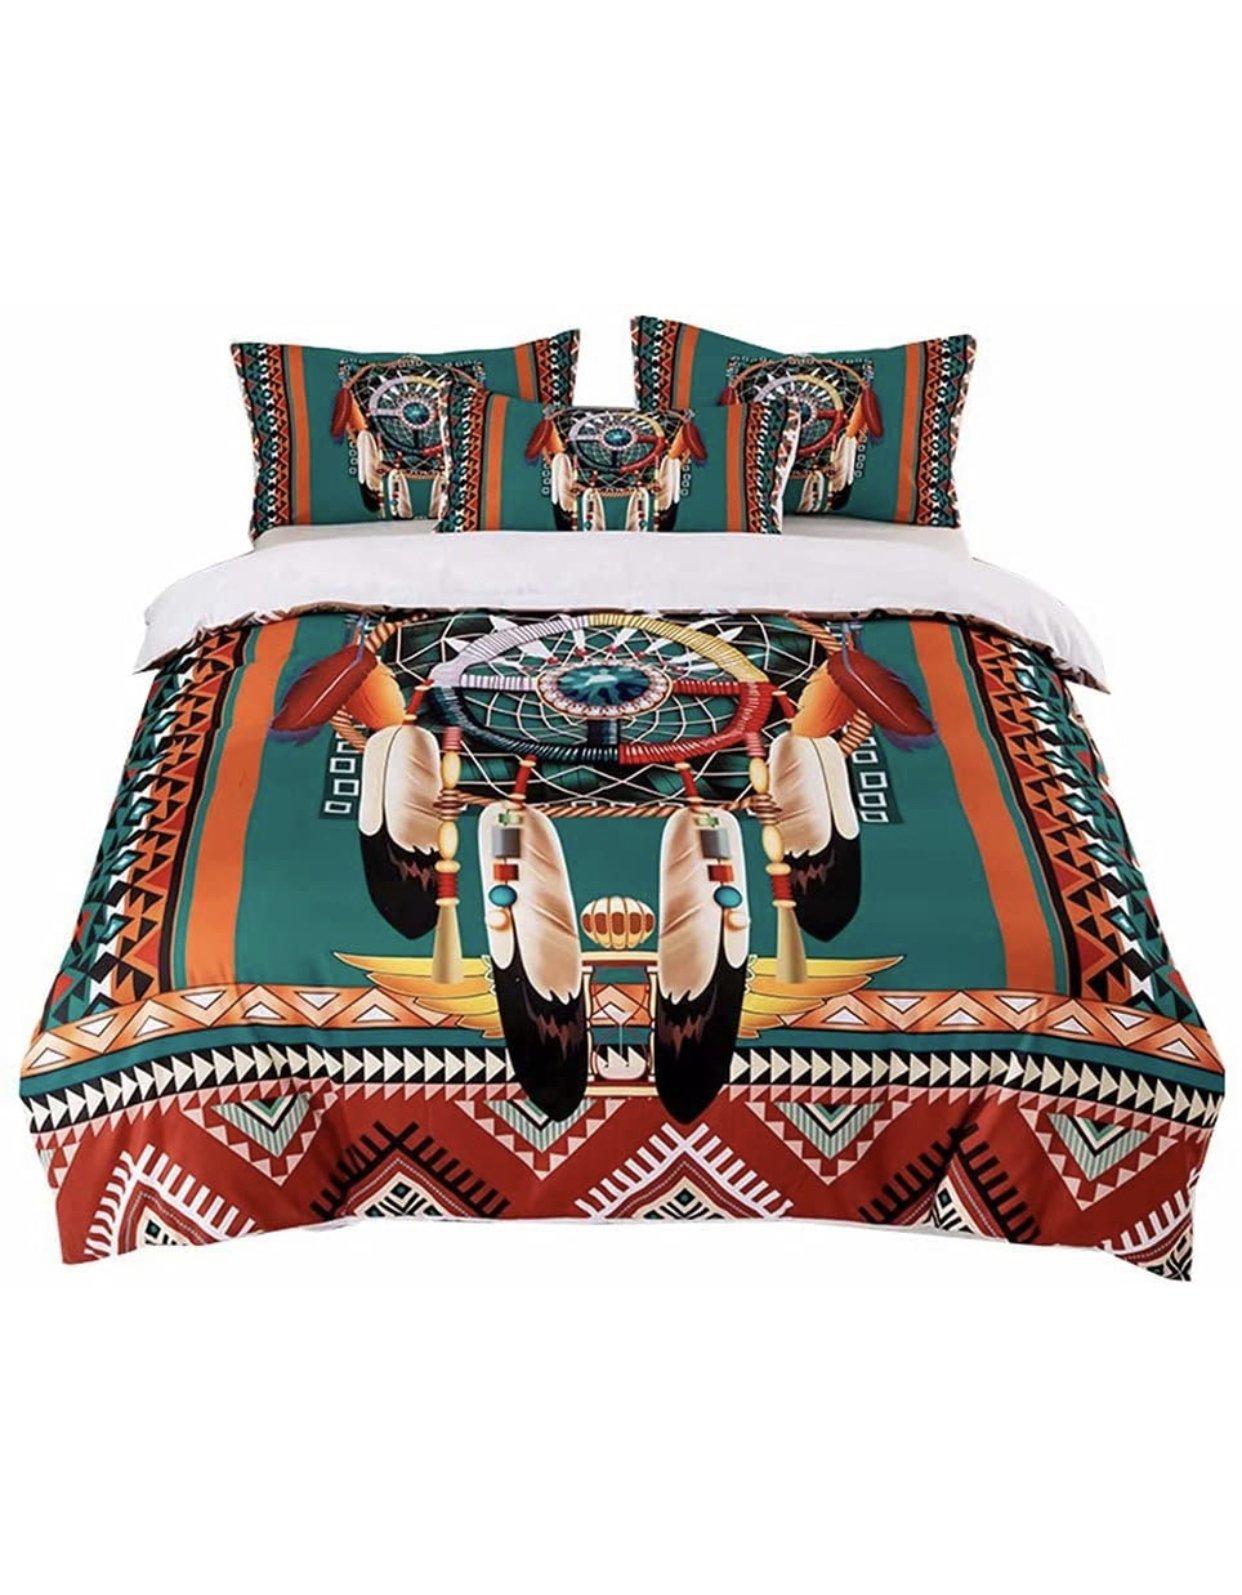 Colorful Dreamcatcher Native Bedding Set